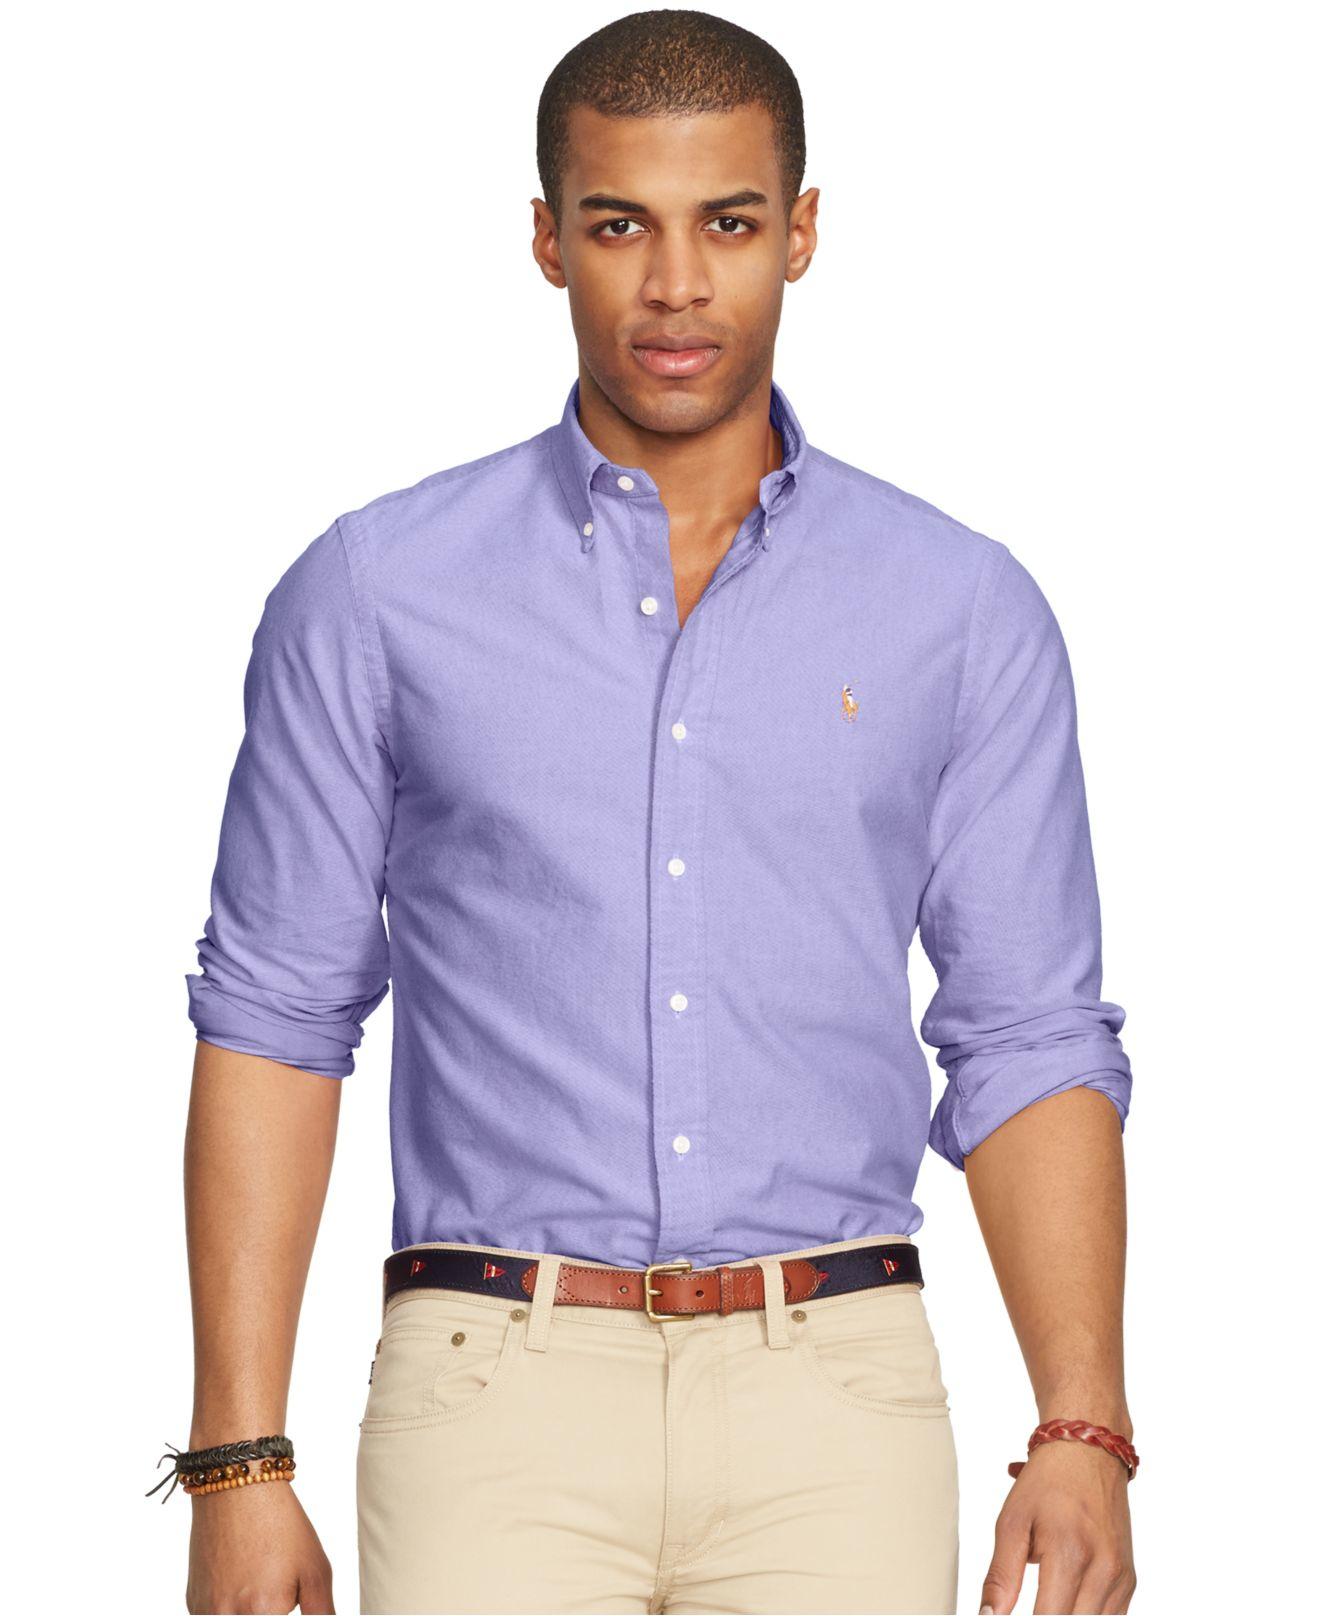 Polo ralph lauren oxford shirt in purple for men royal for Royal purple mens dress shirts